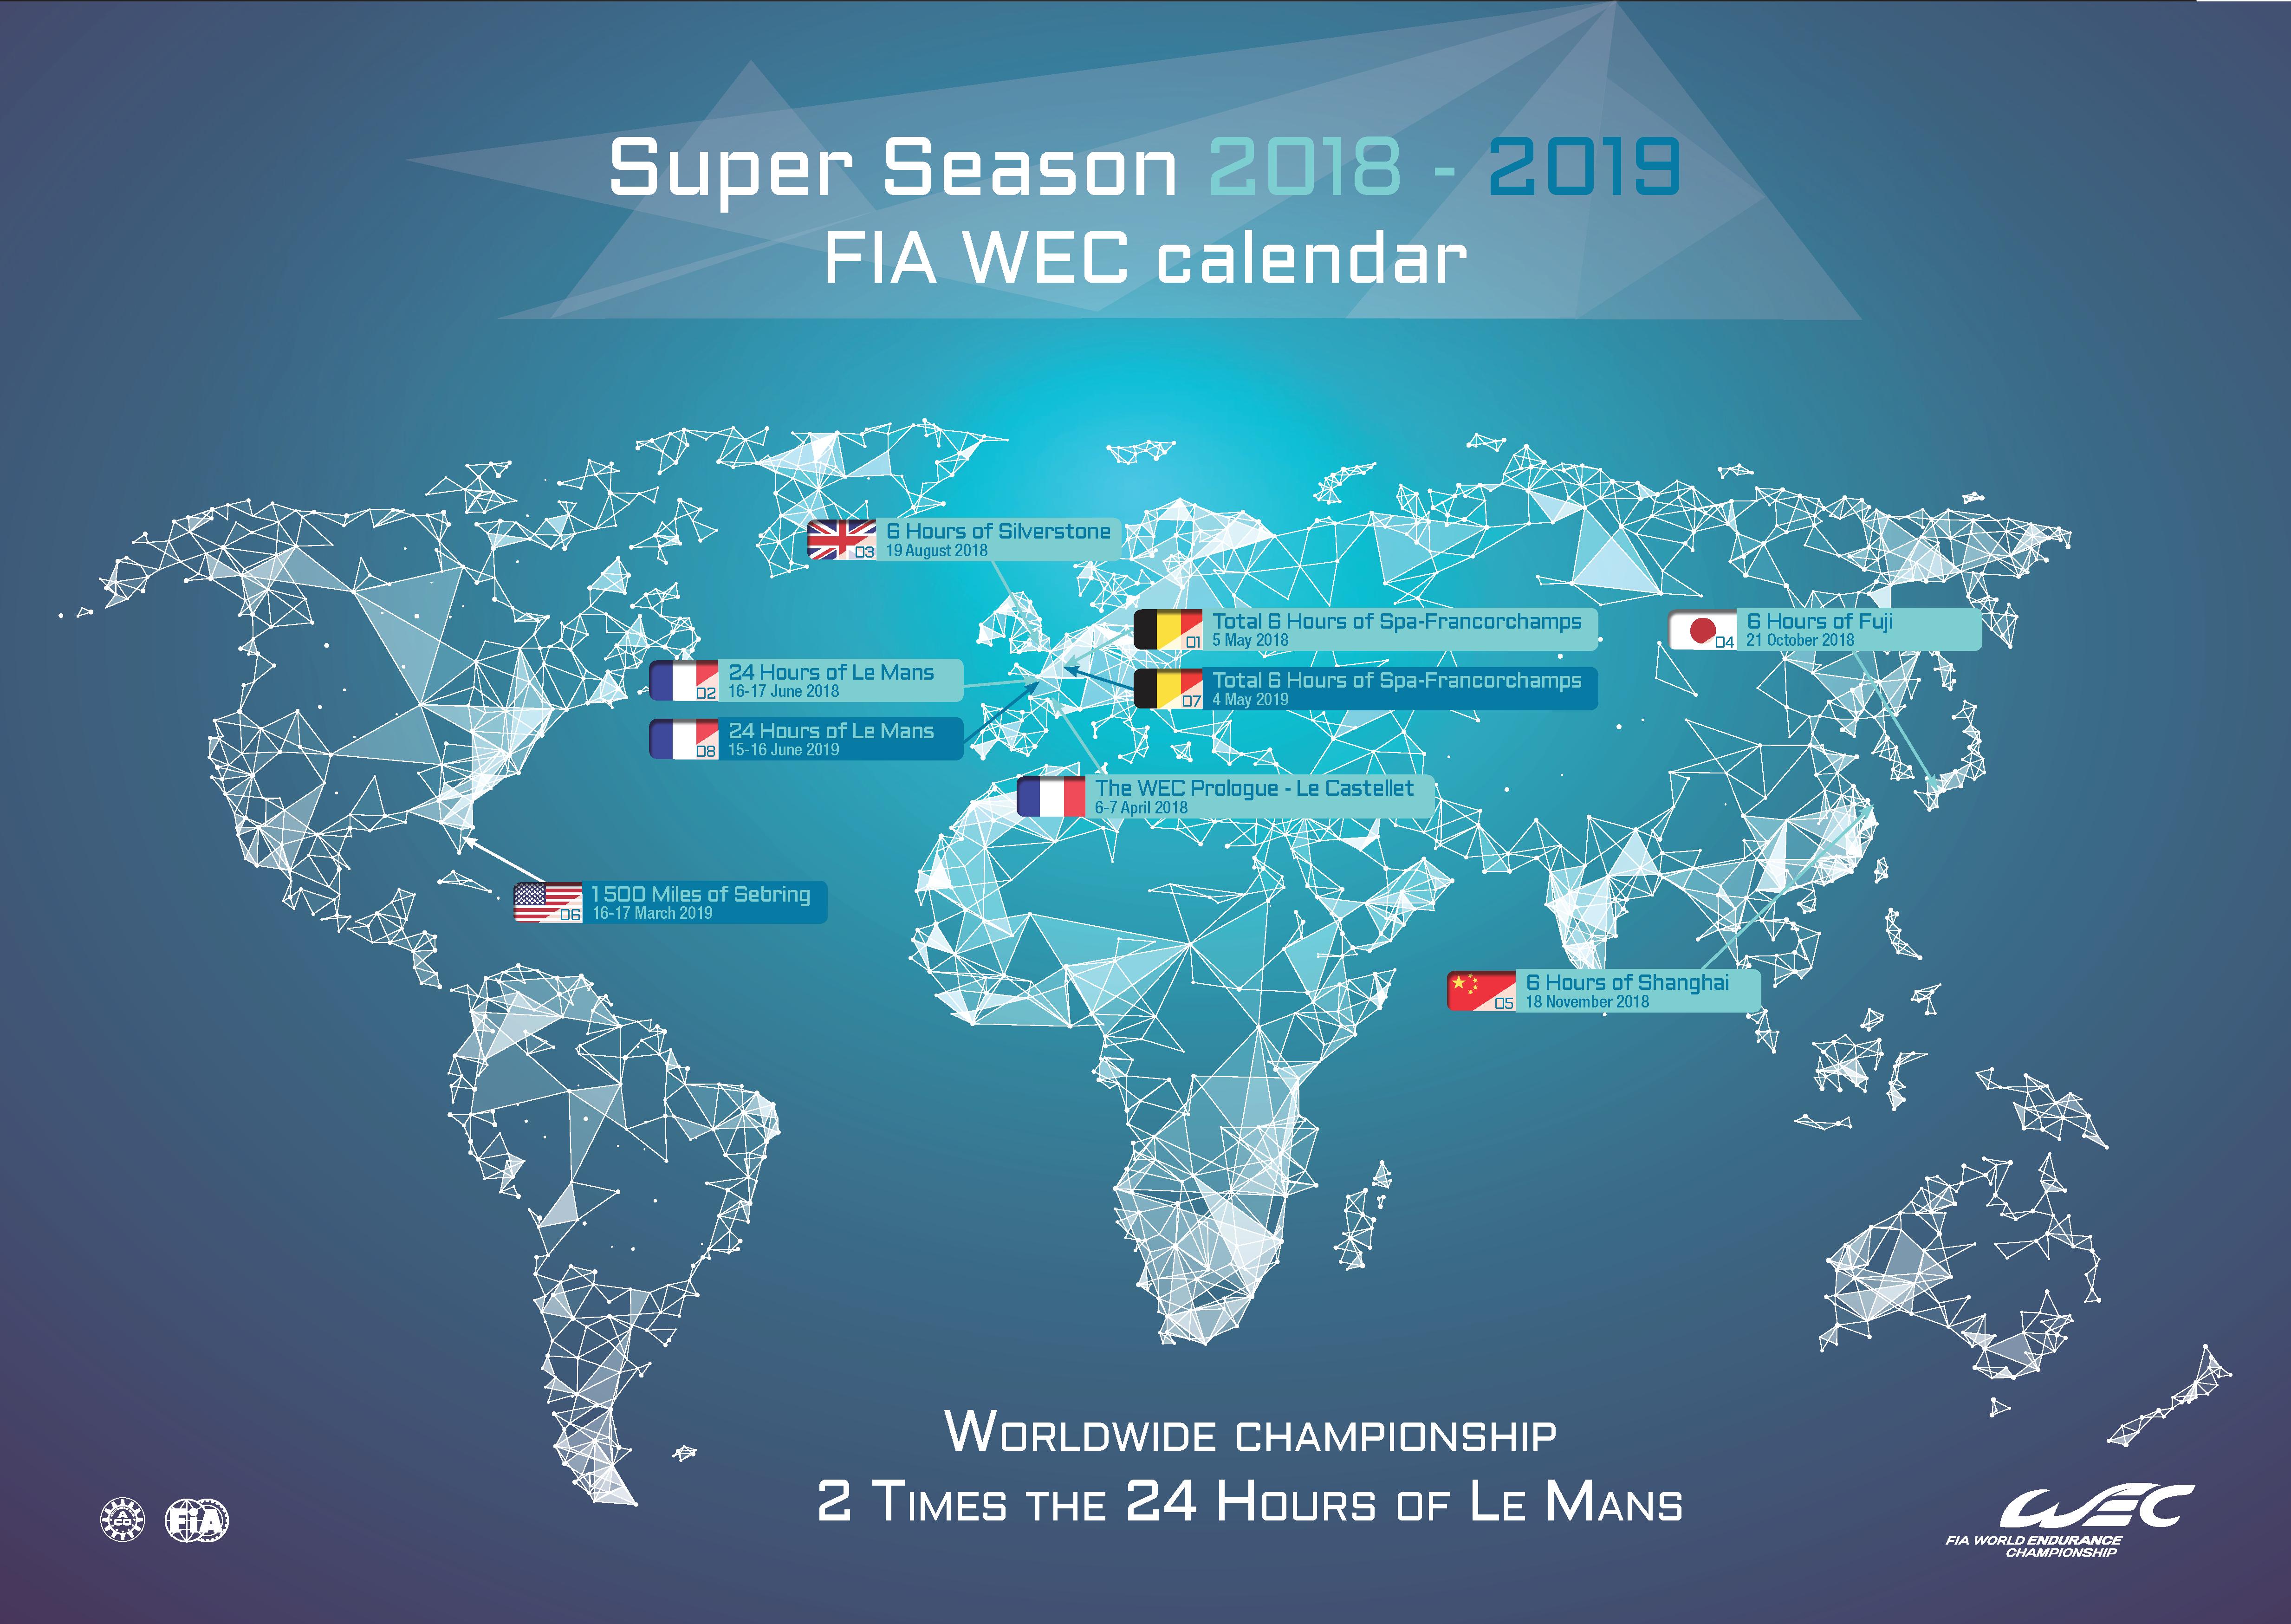 FIA WEC Calendar Super Season